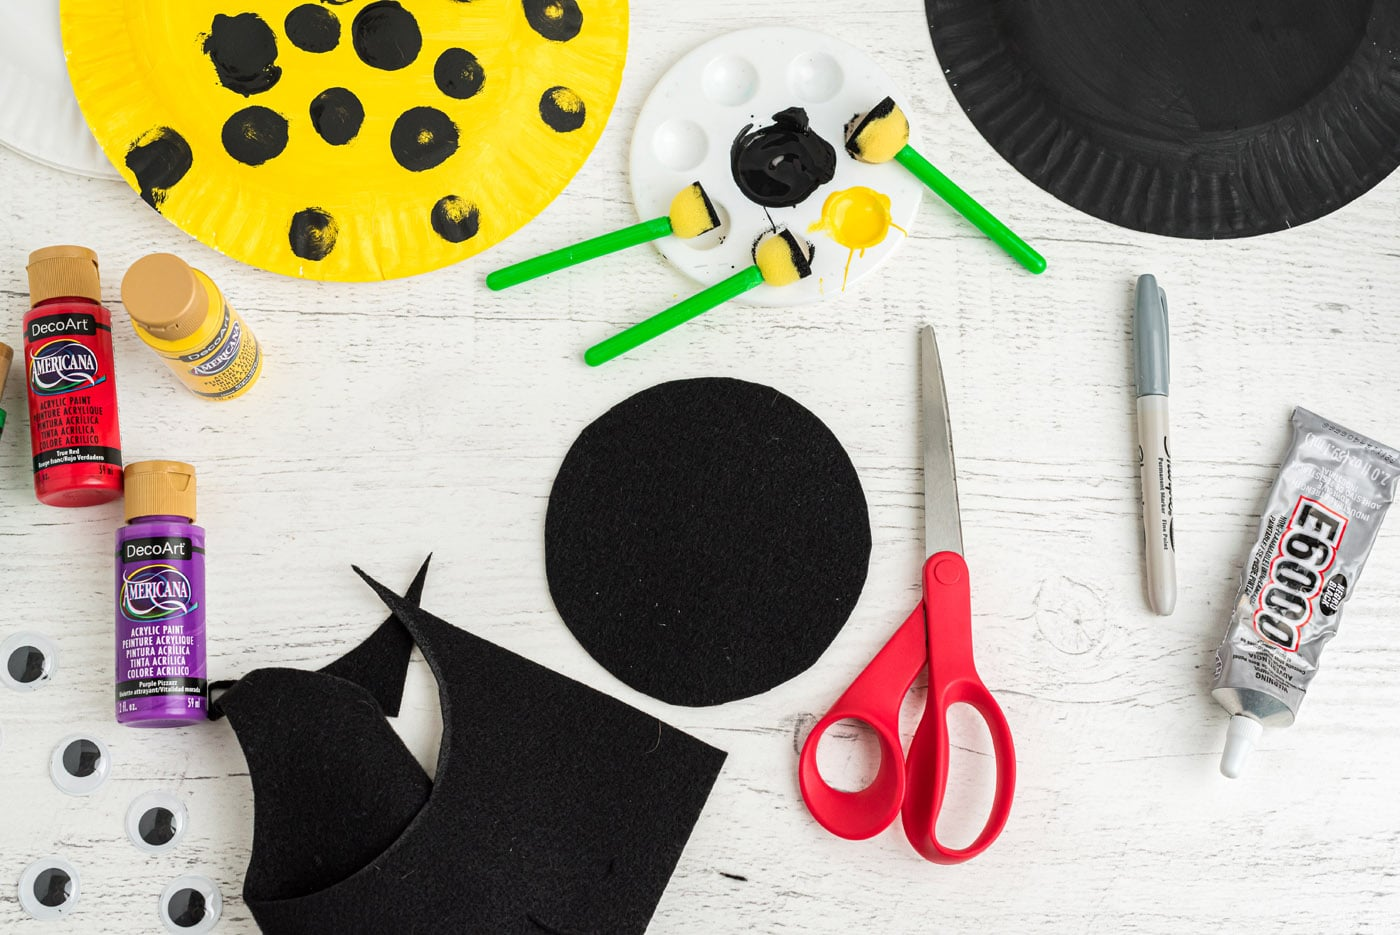 black felt cut into a circle with scissors